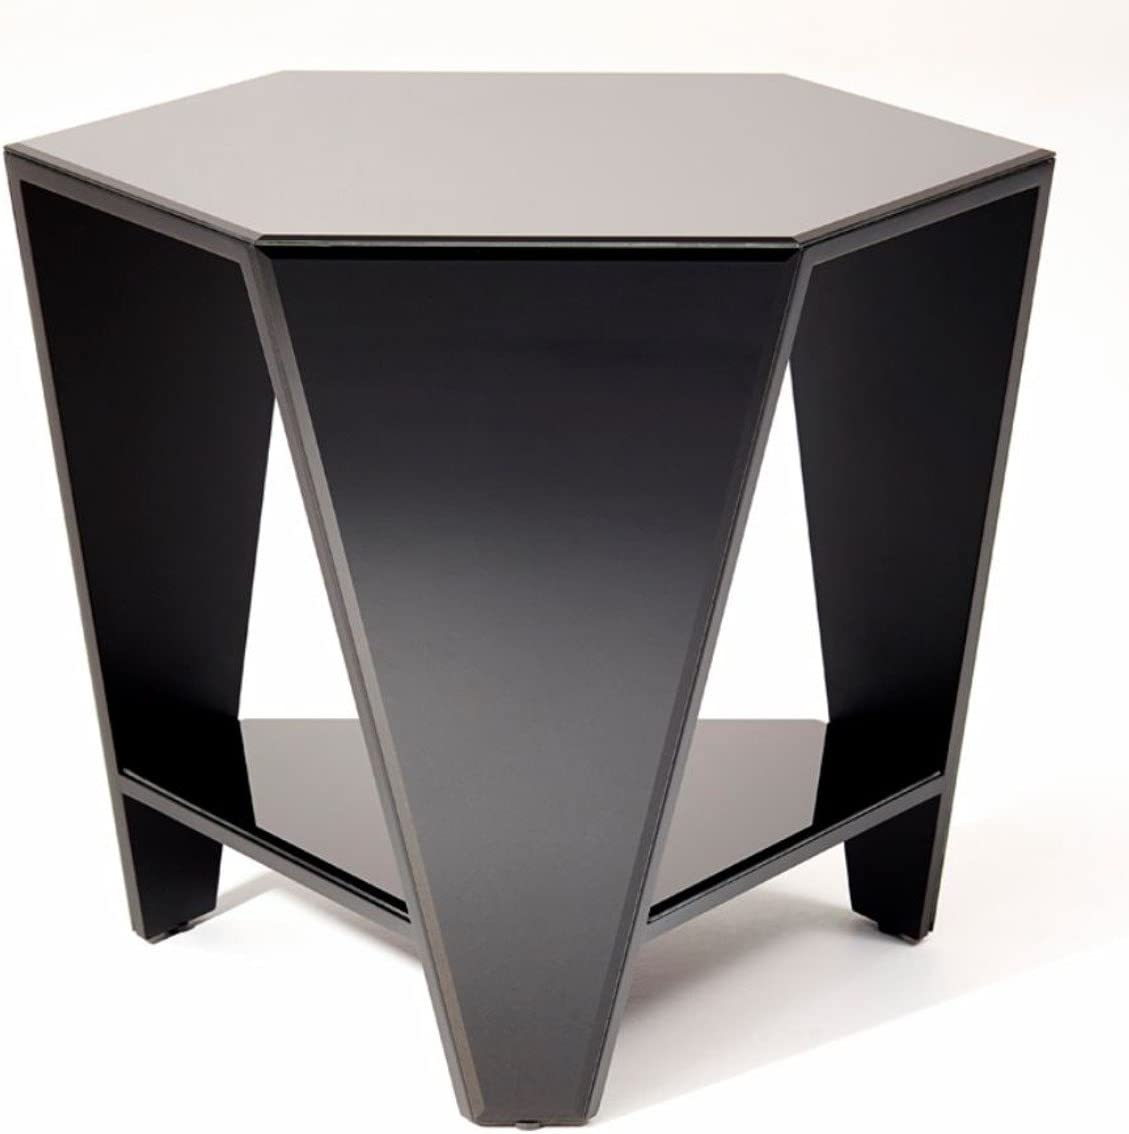 Casa Padrino Side Table With Black Mirror Glass 59 X 51 X H 49 Cm Designer Furniture Amazon Co Uk Kitchen Home